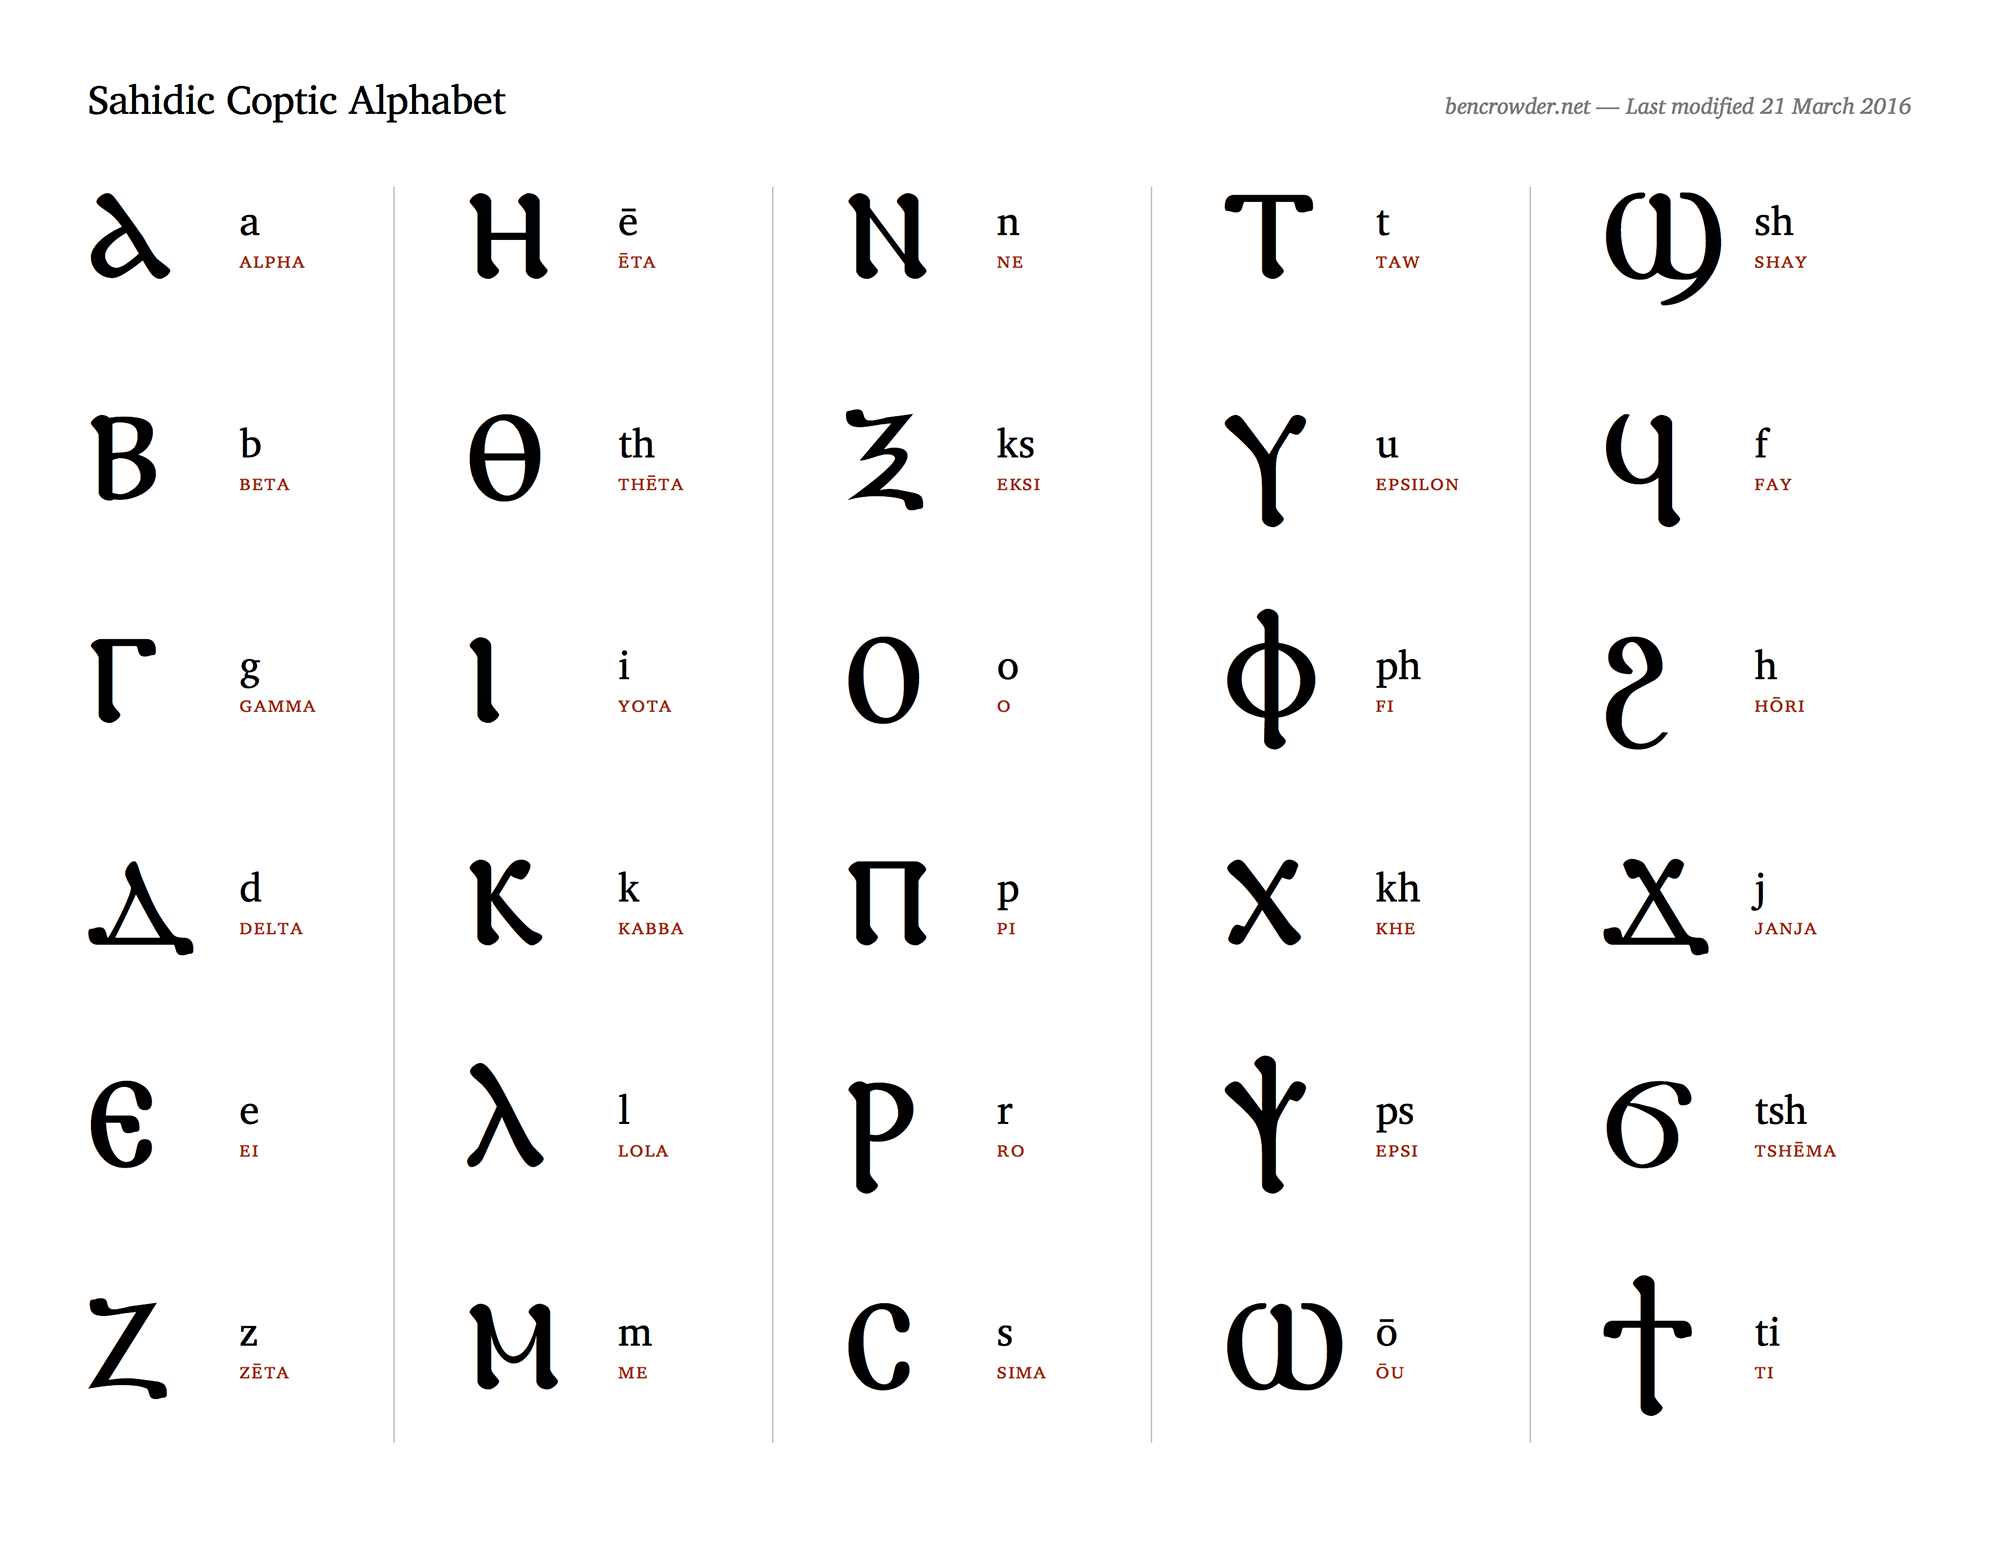 Sahidic Coptic Alphabet Chart